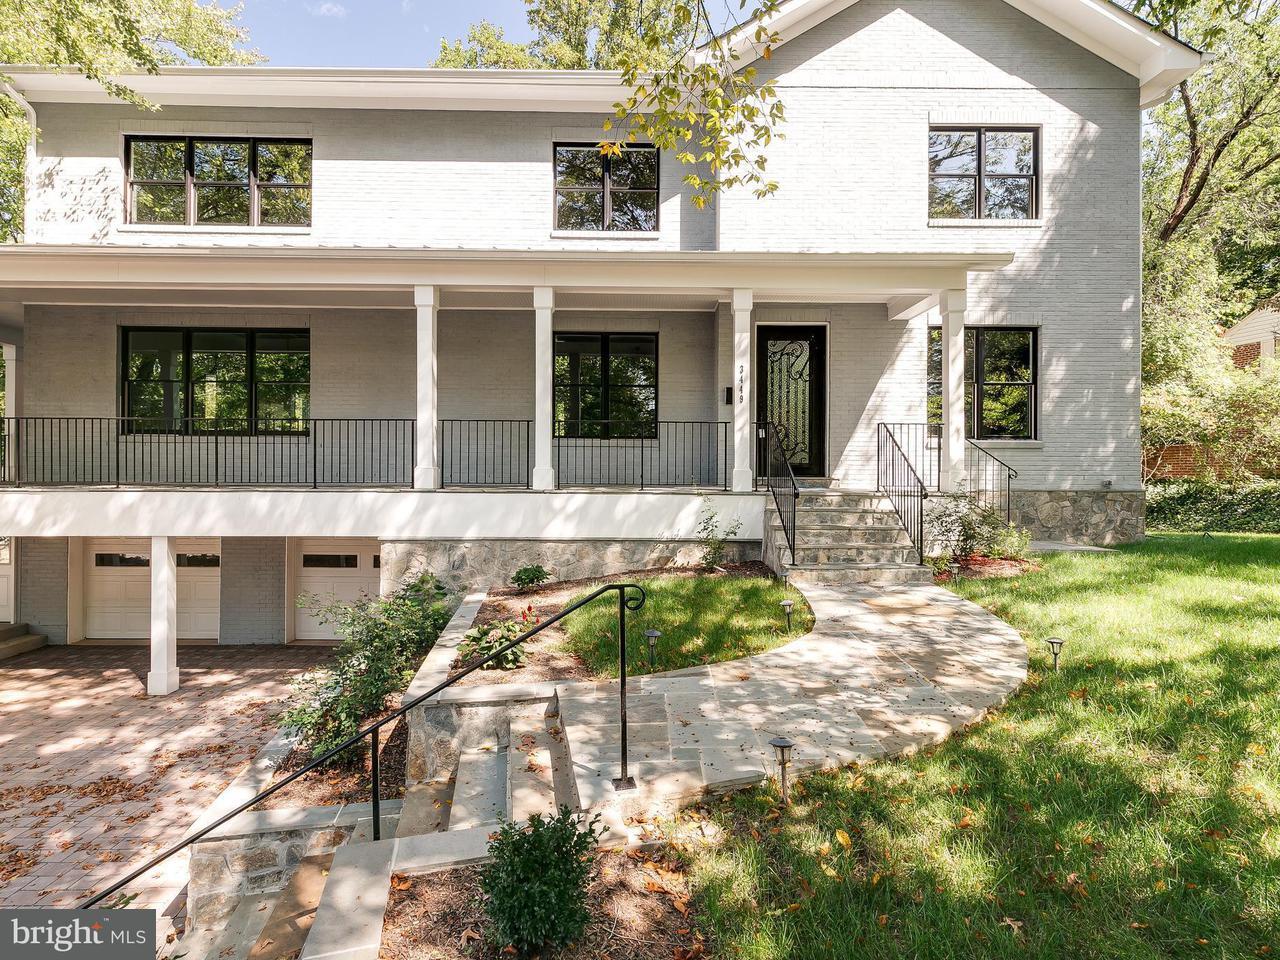 Single Family Home for Sale at 3449 N. RANDOLPH Street 3449 N. RANDOLPH Street Arlington, Virginia 22207 United States